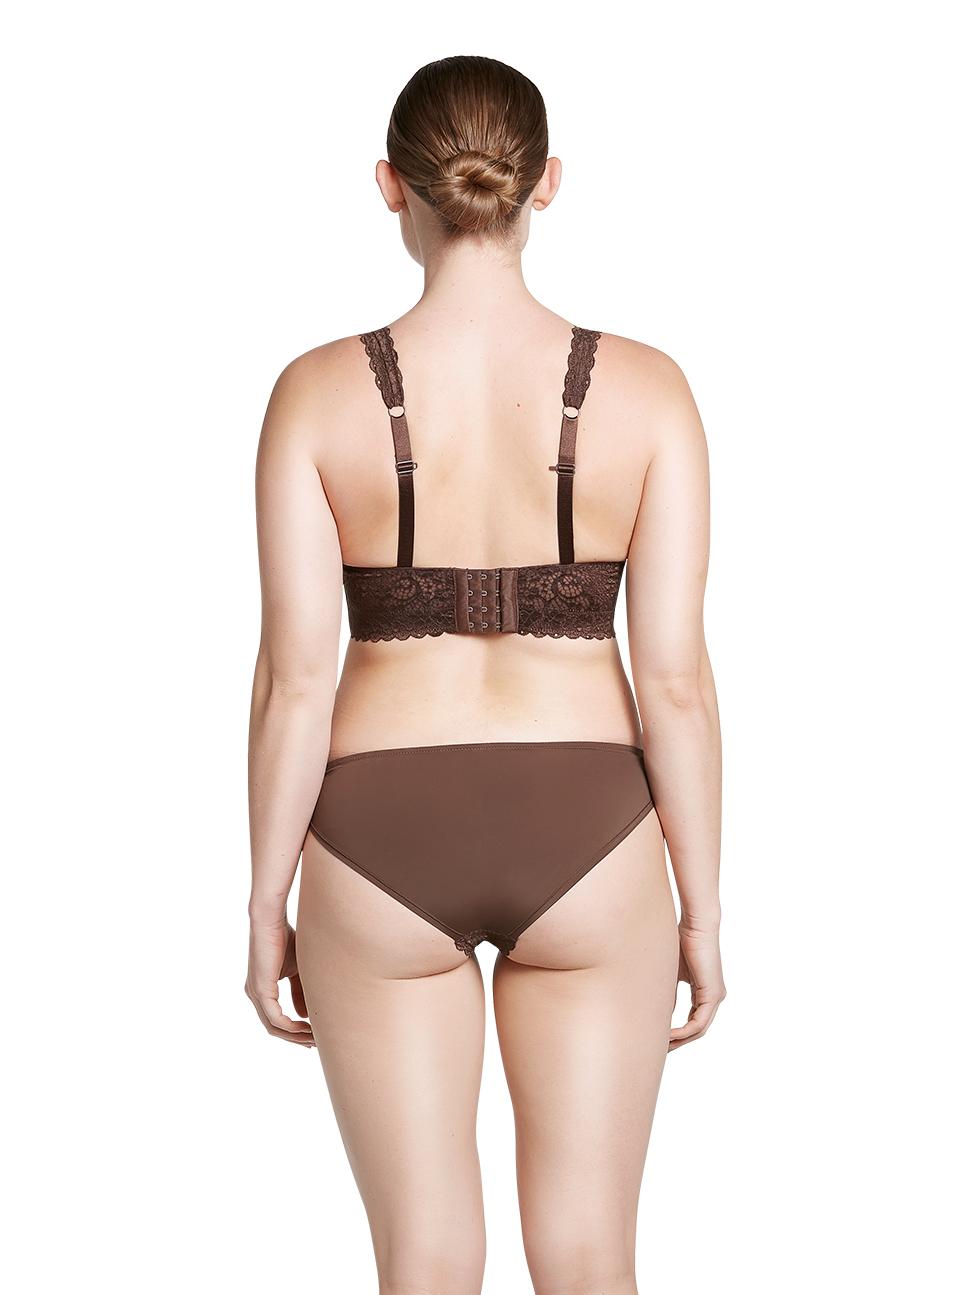 PARFAIT Adriana LaceBralette P5482 Bikini P5483 IntenseBrown Back - Adriana Lace Bralette Deep Nude P5482